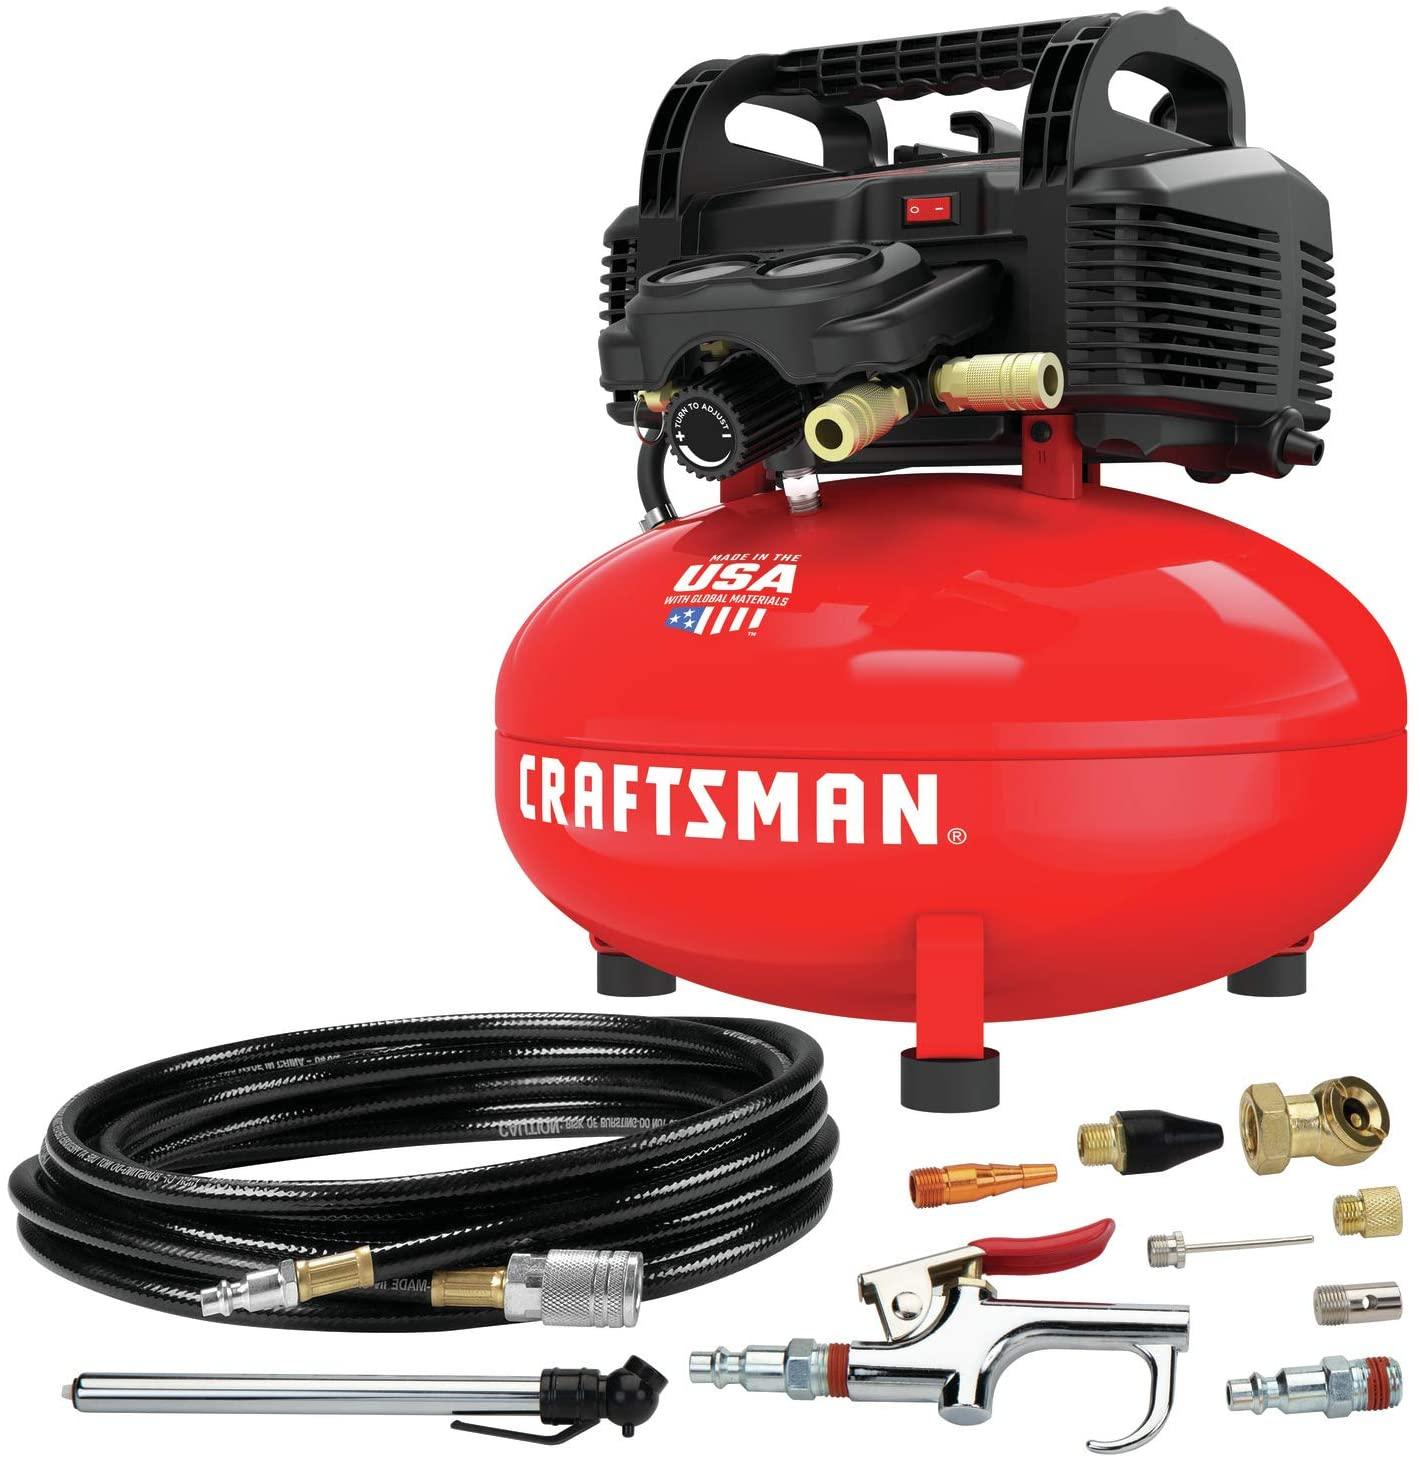 Compresor Craftsman